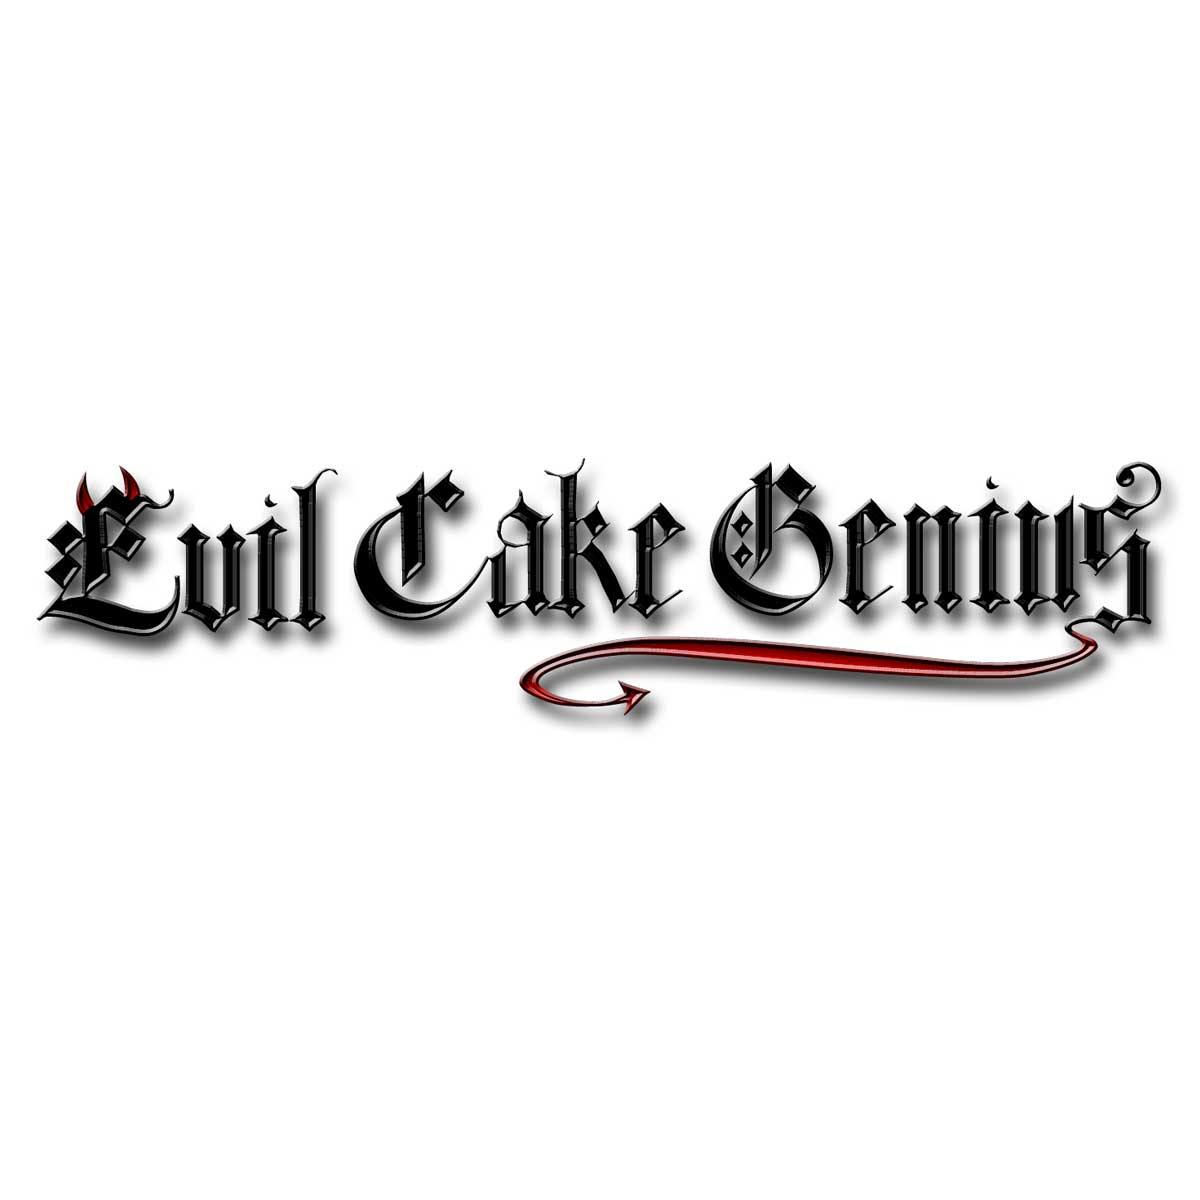 Impression Mold Scrunch Ruffle - Evil Cake Genius